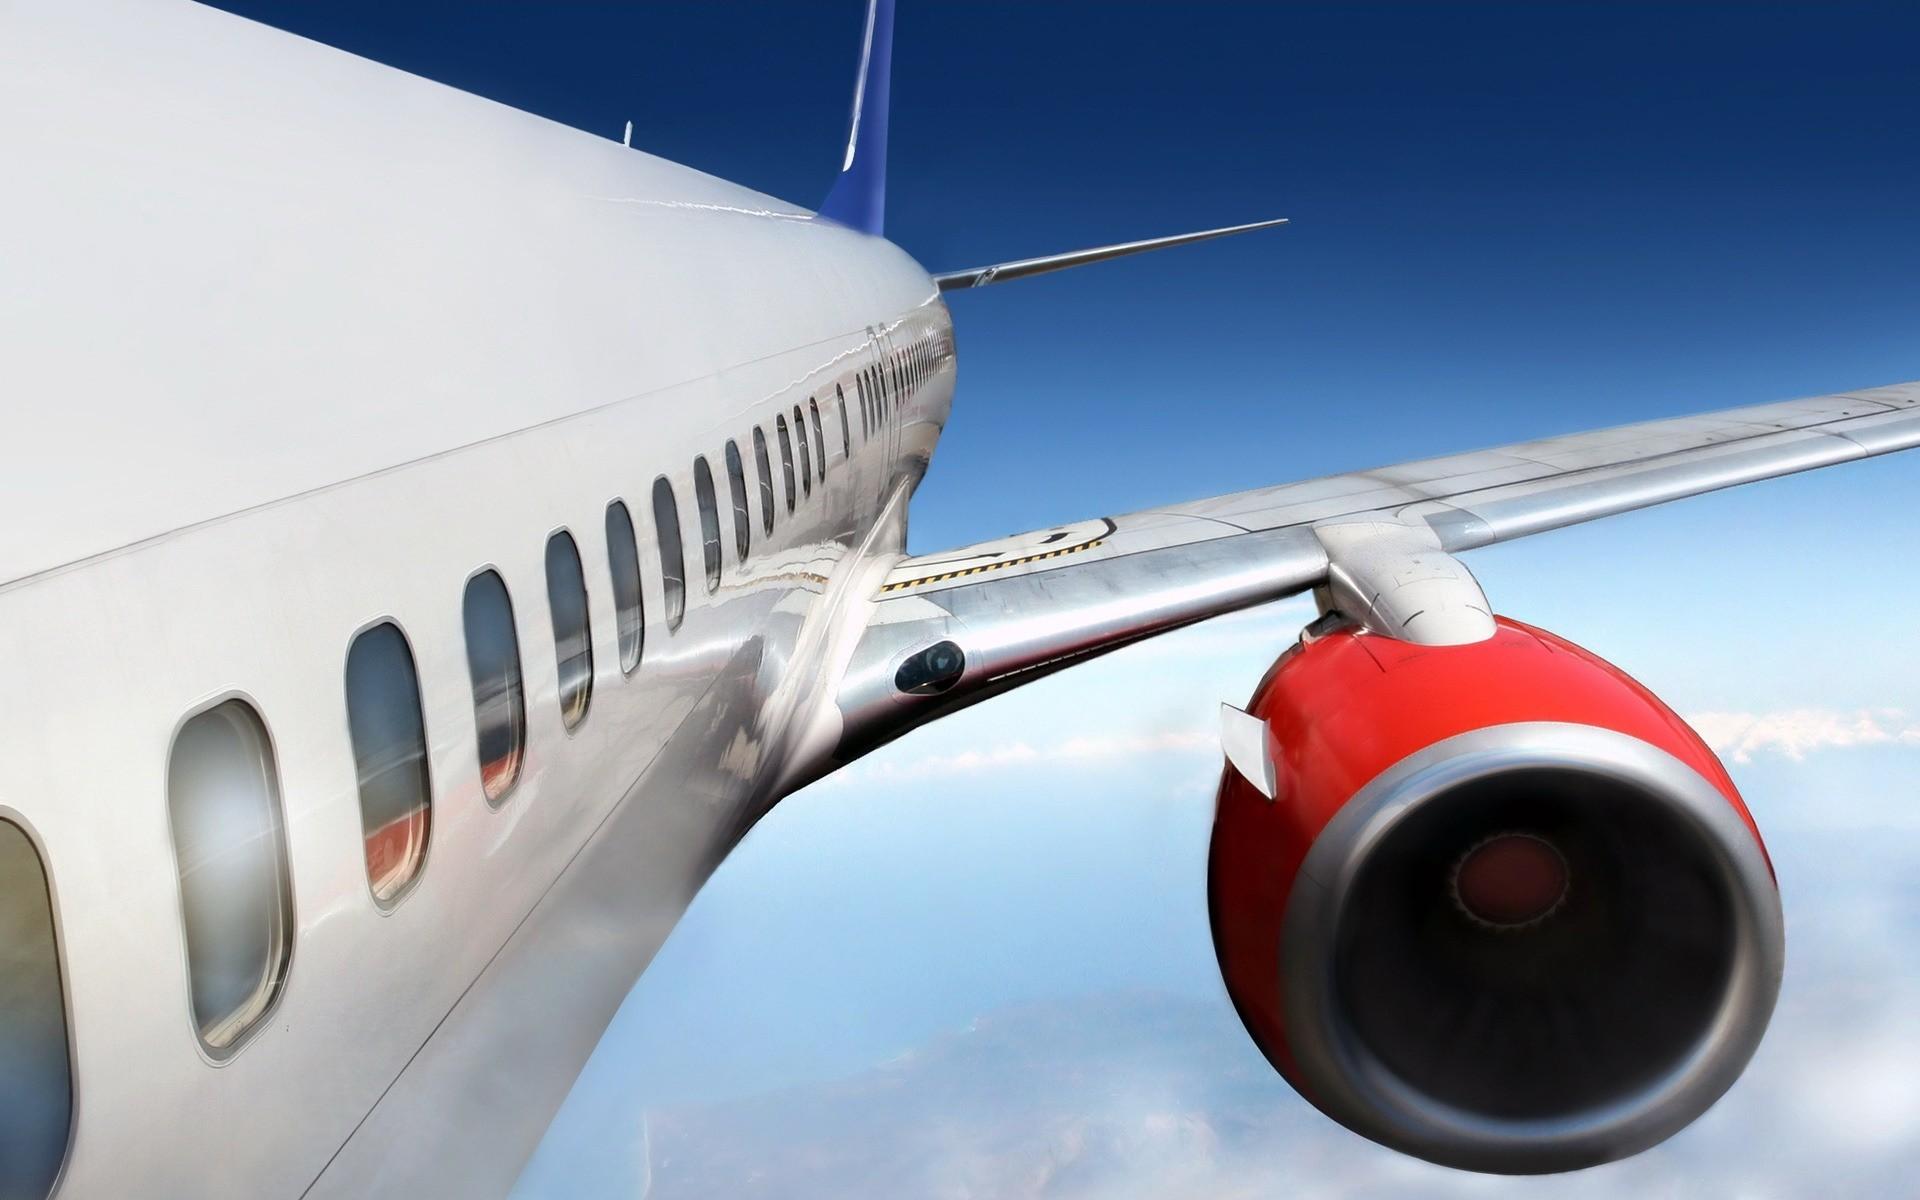 боинг, самолет в небе, облака, крыло, мотор